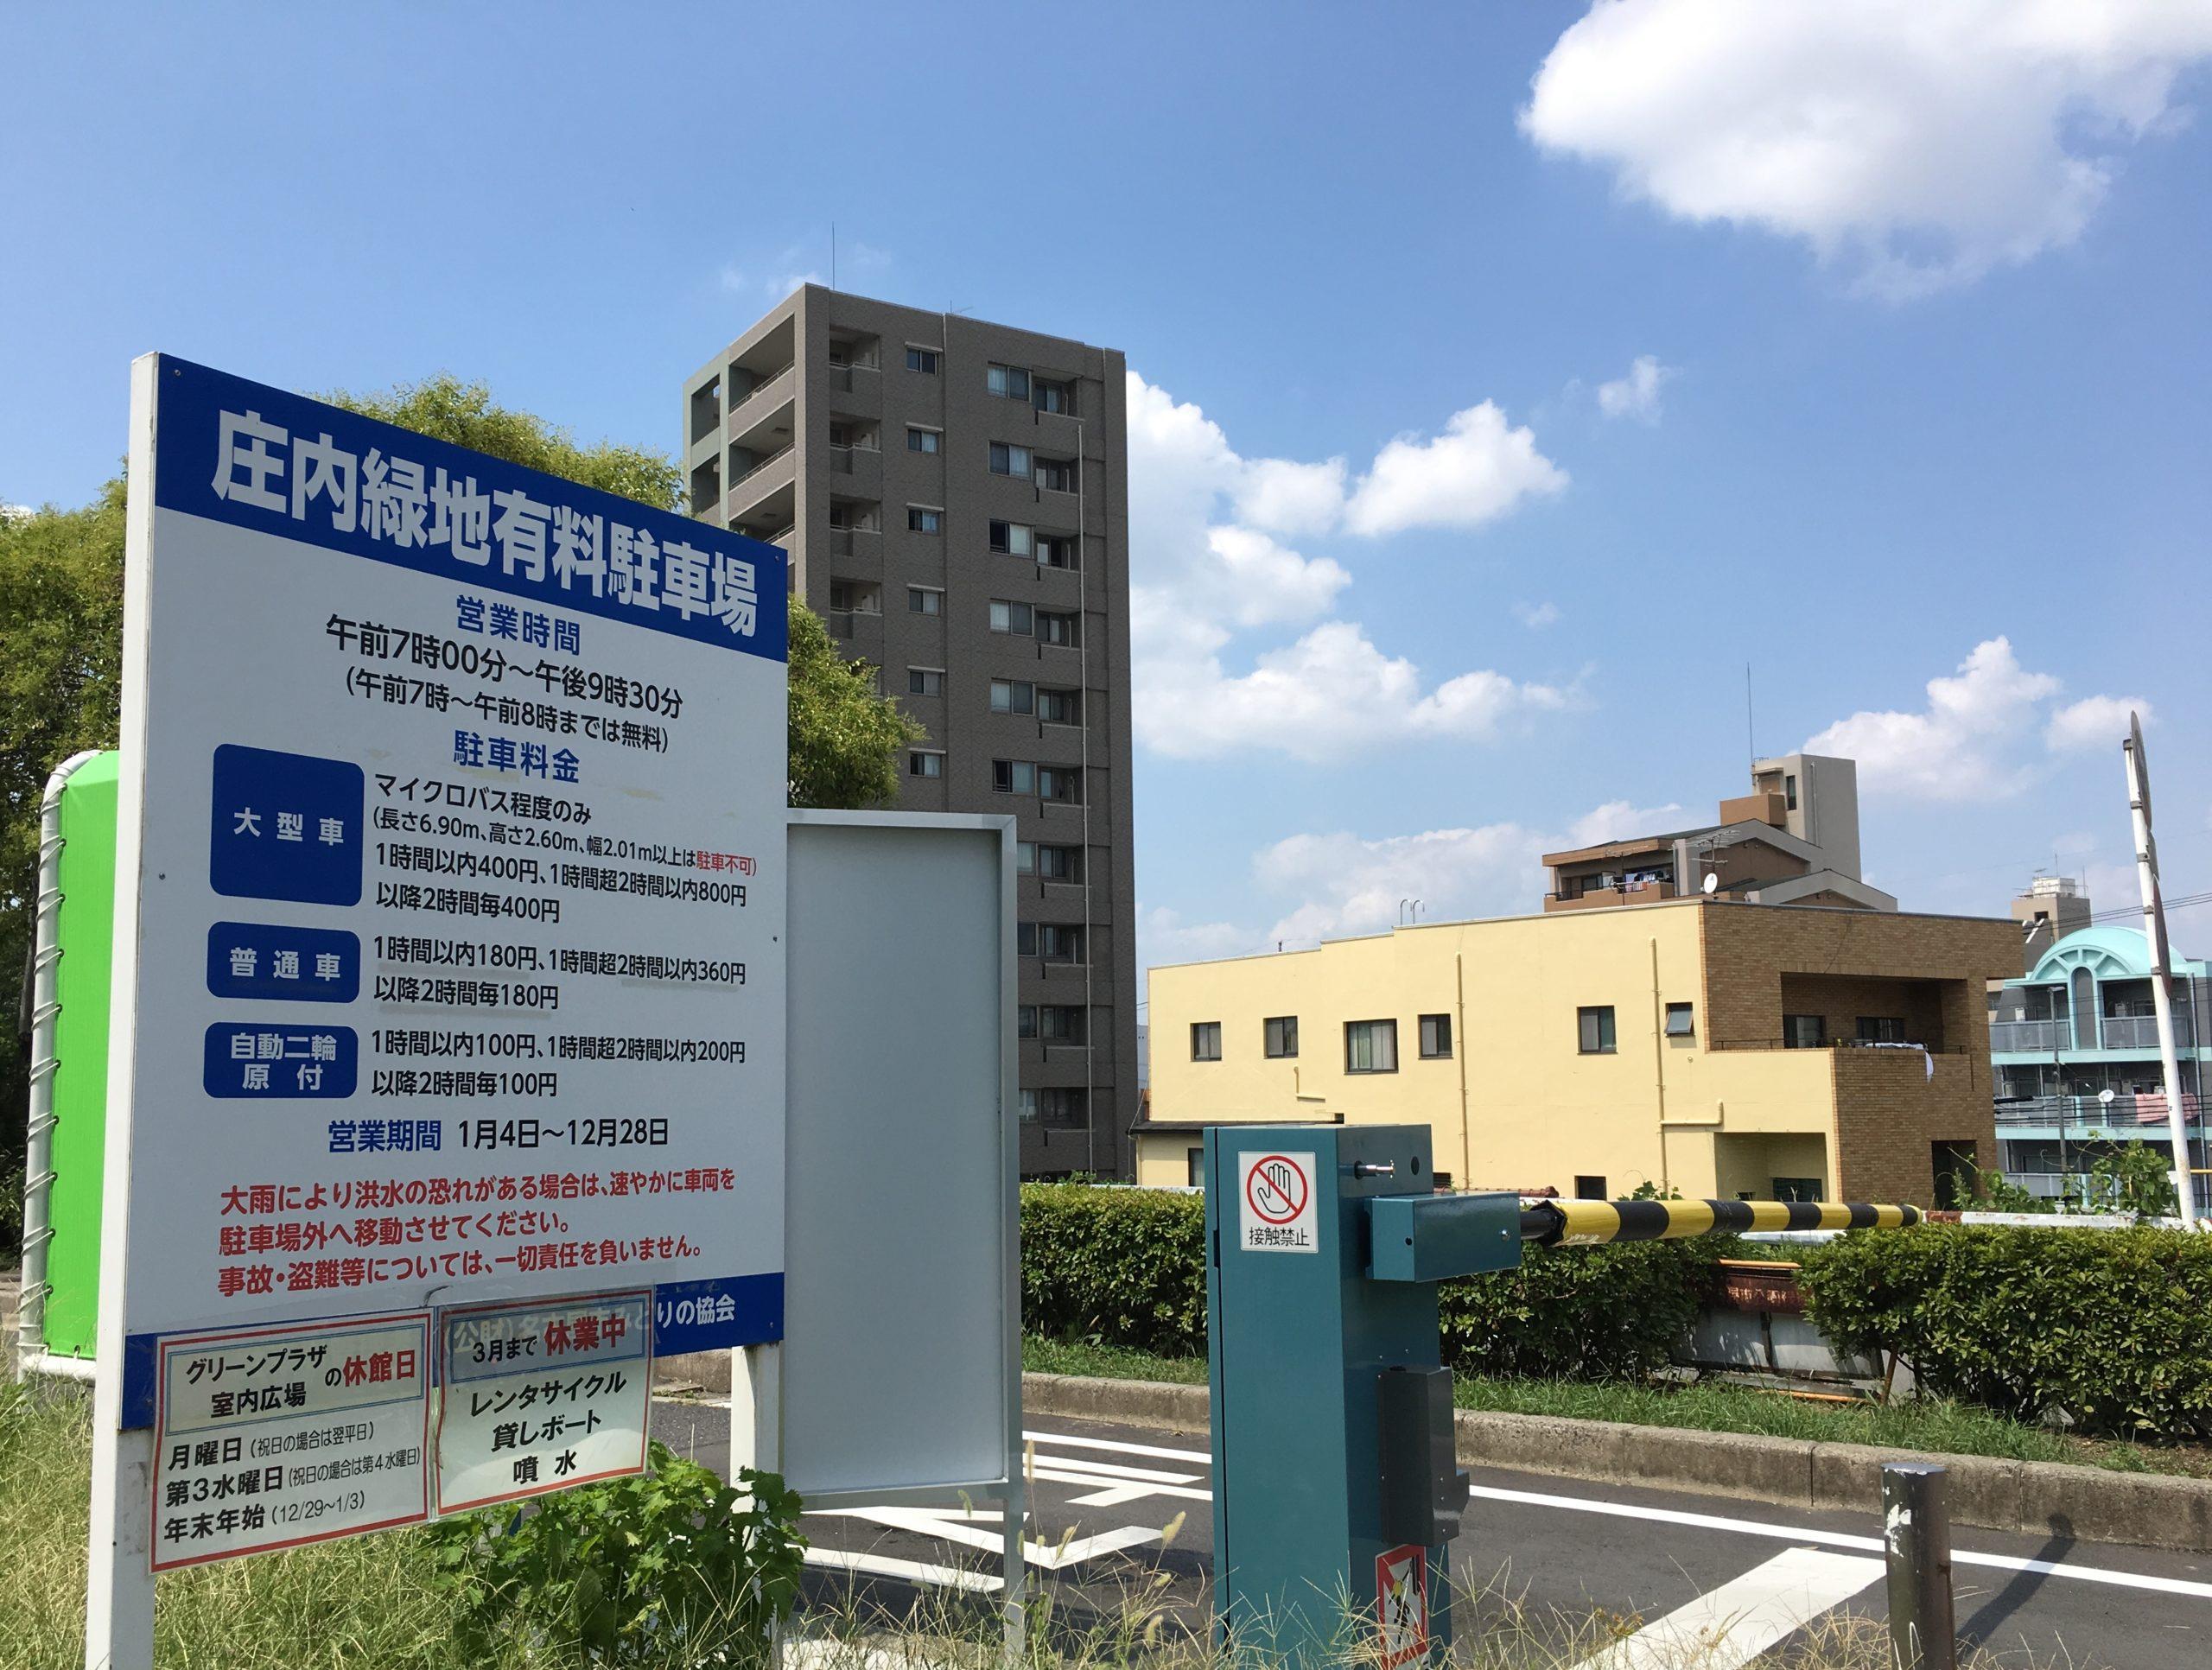 syonairyokuchi-park-mizuasobi